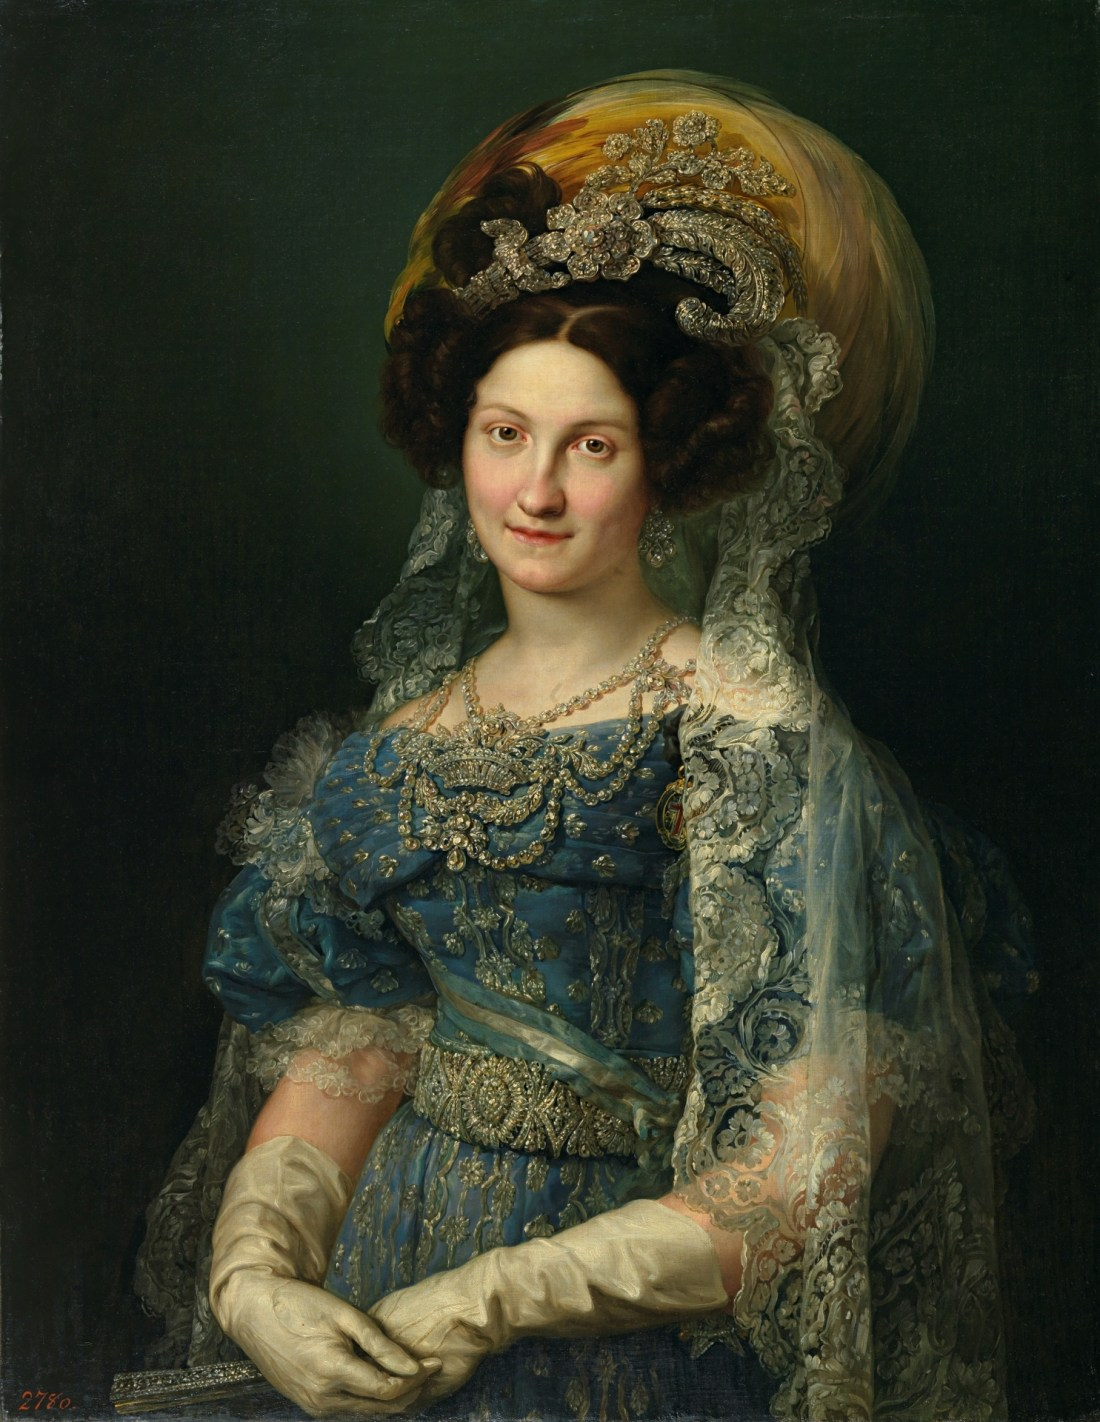 Maria Cristina de Bourbon-Sicily, Queen of Spain. 1830.